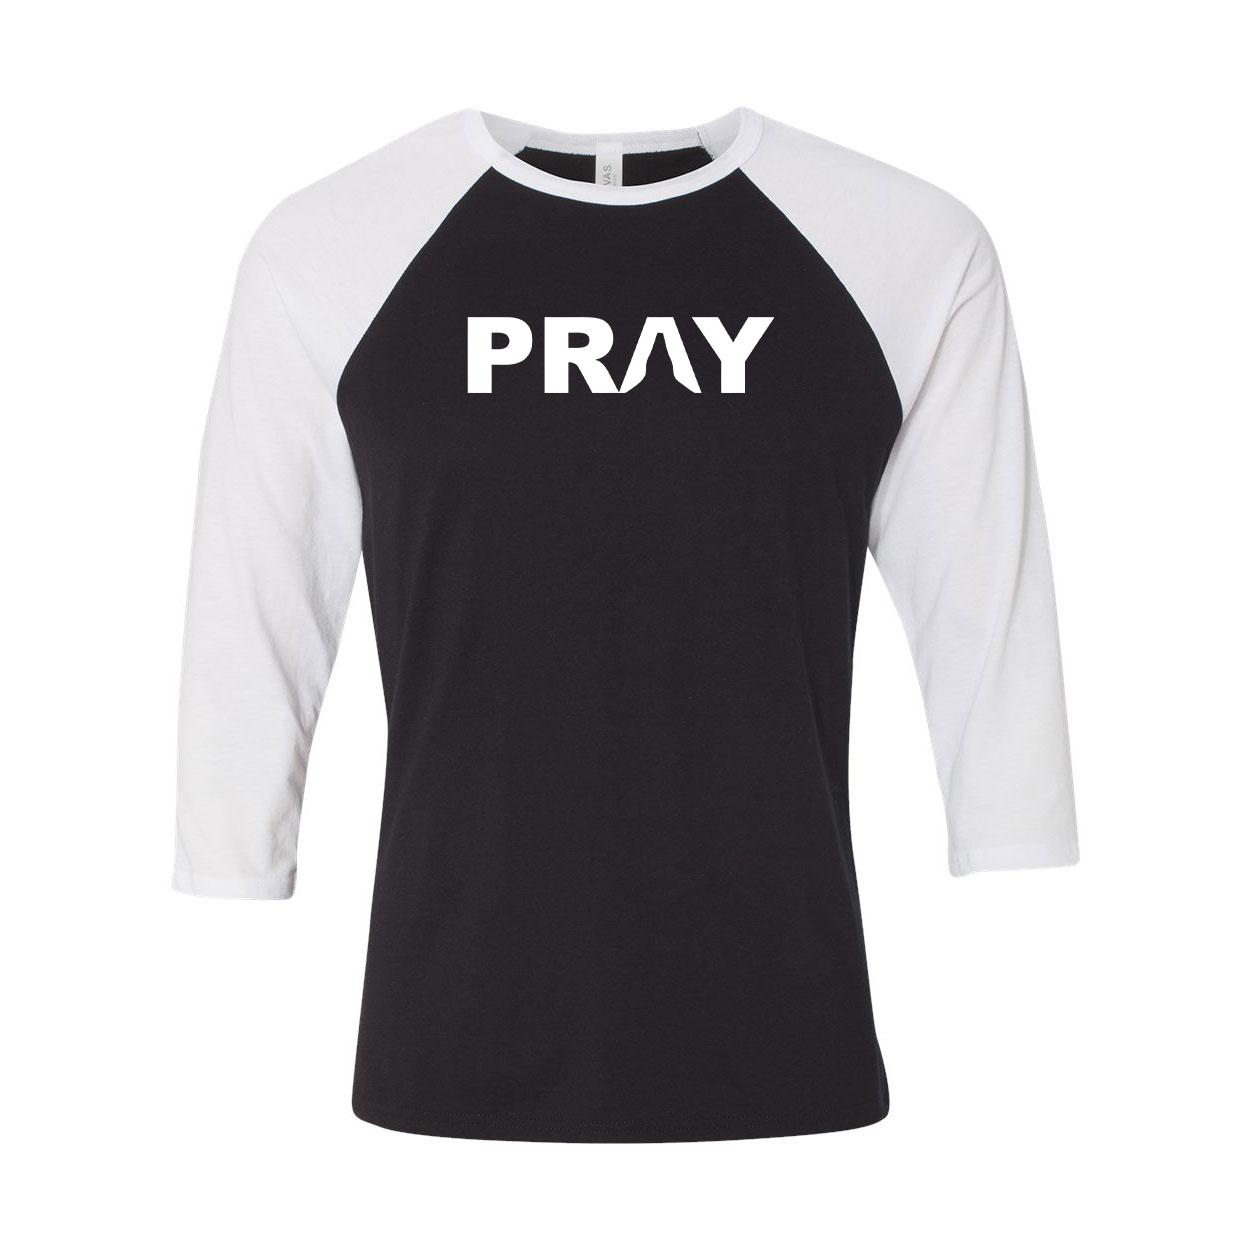 Pray Hands Logo Classic Raglan Shirt Black/White (White Logo)